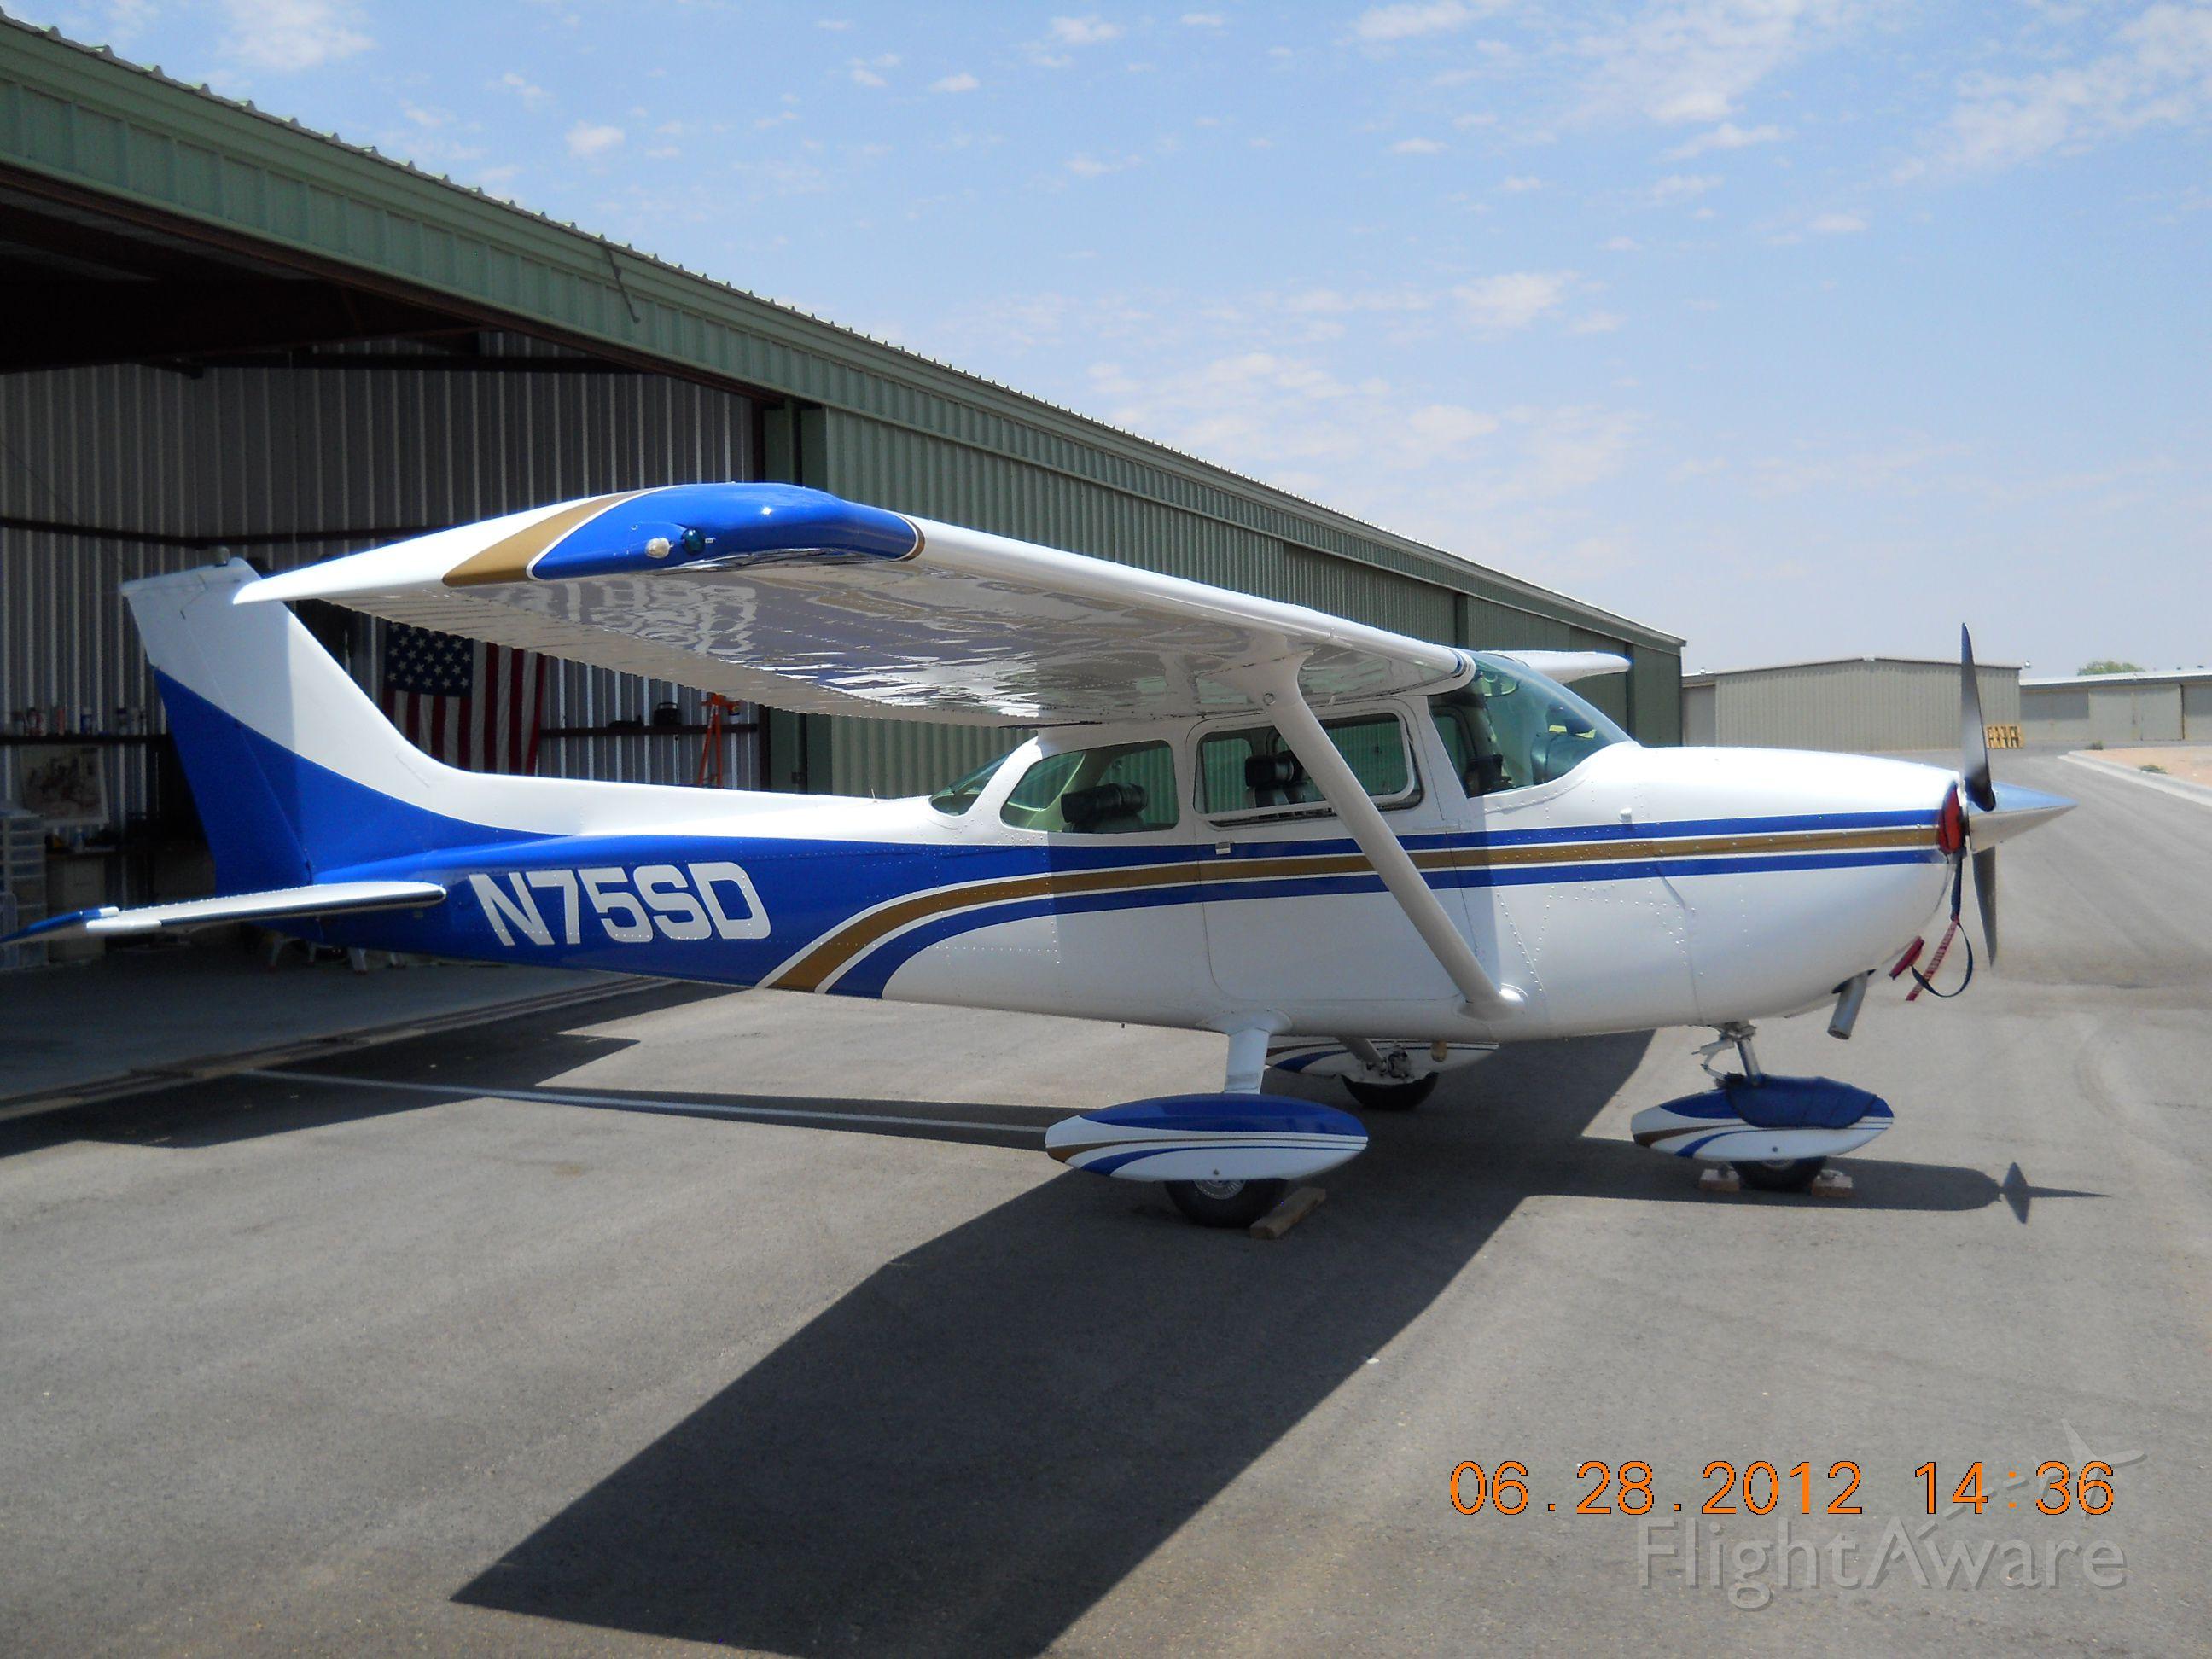 Cessna Skylane (N75SD)